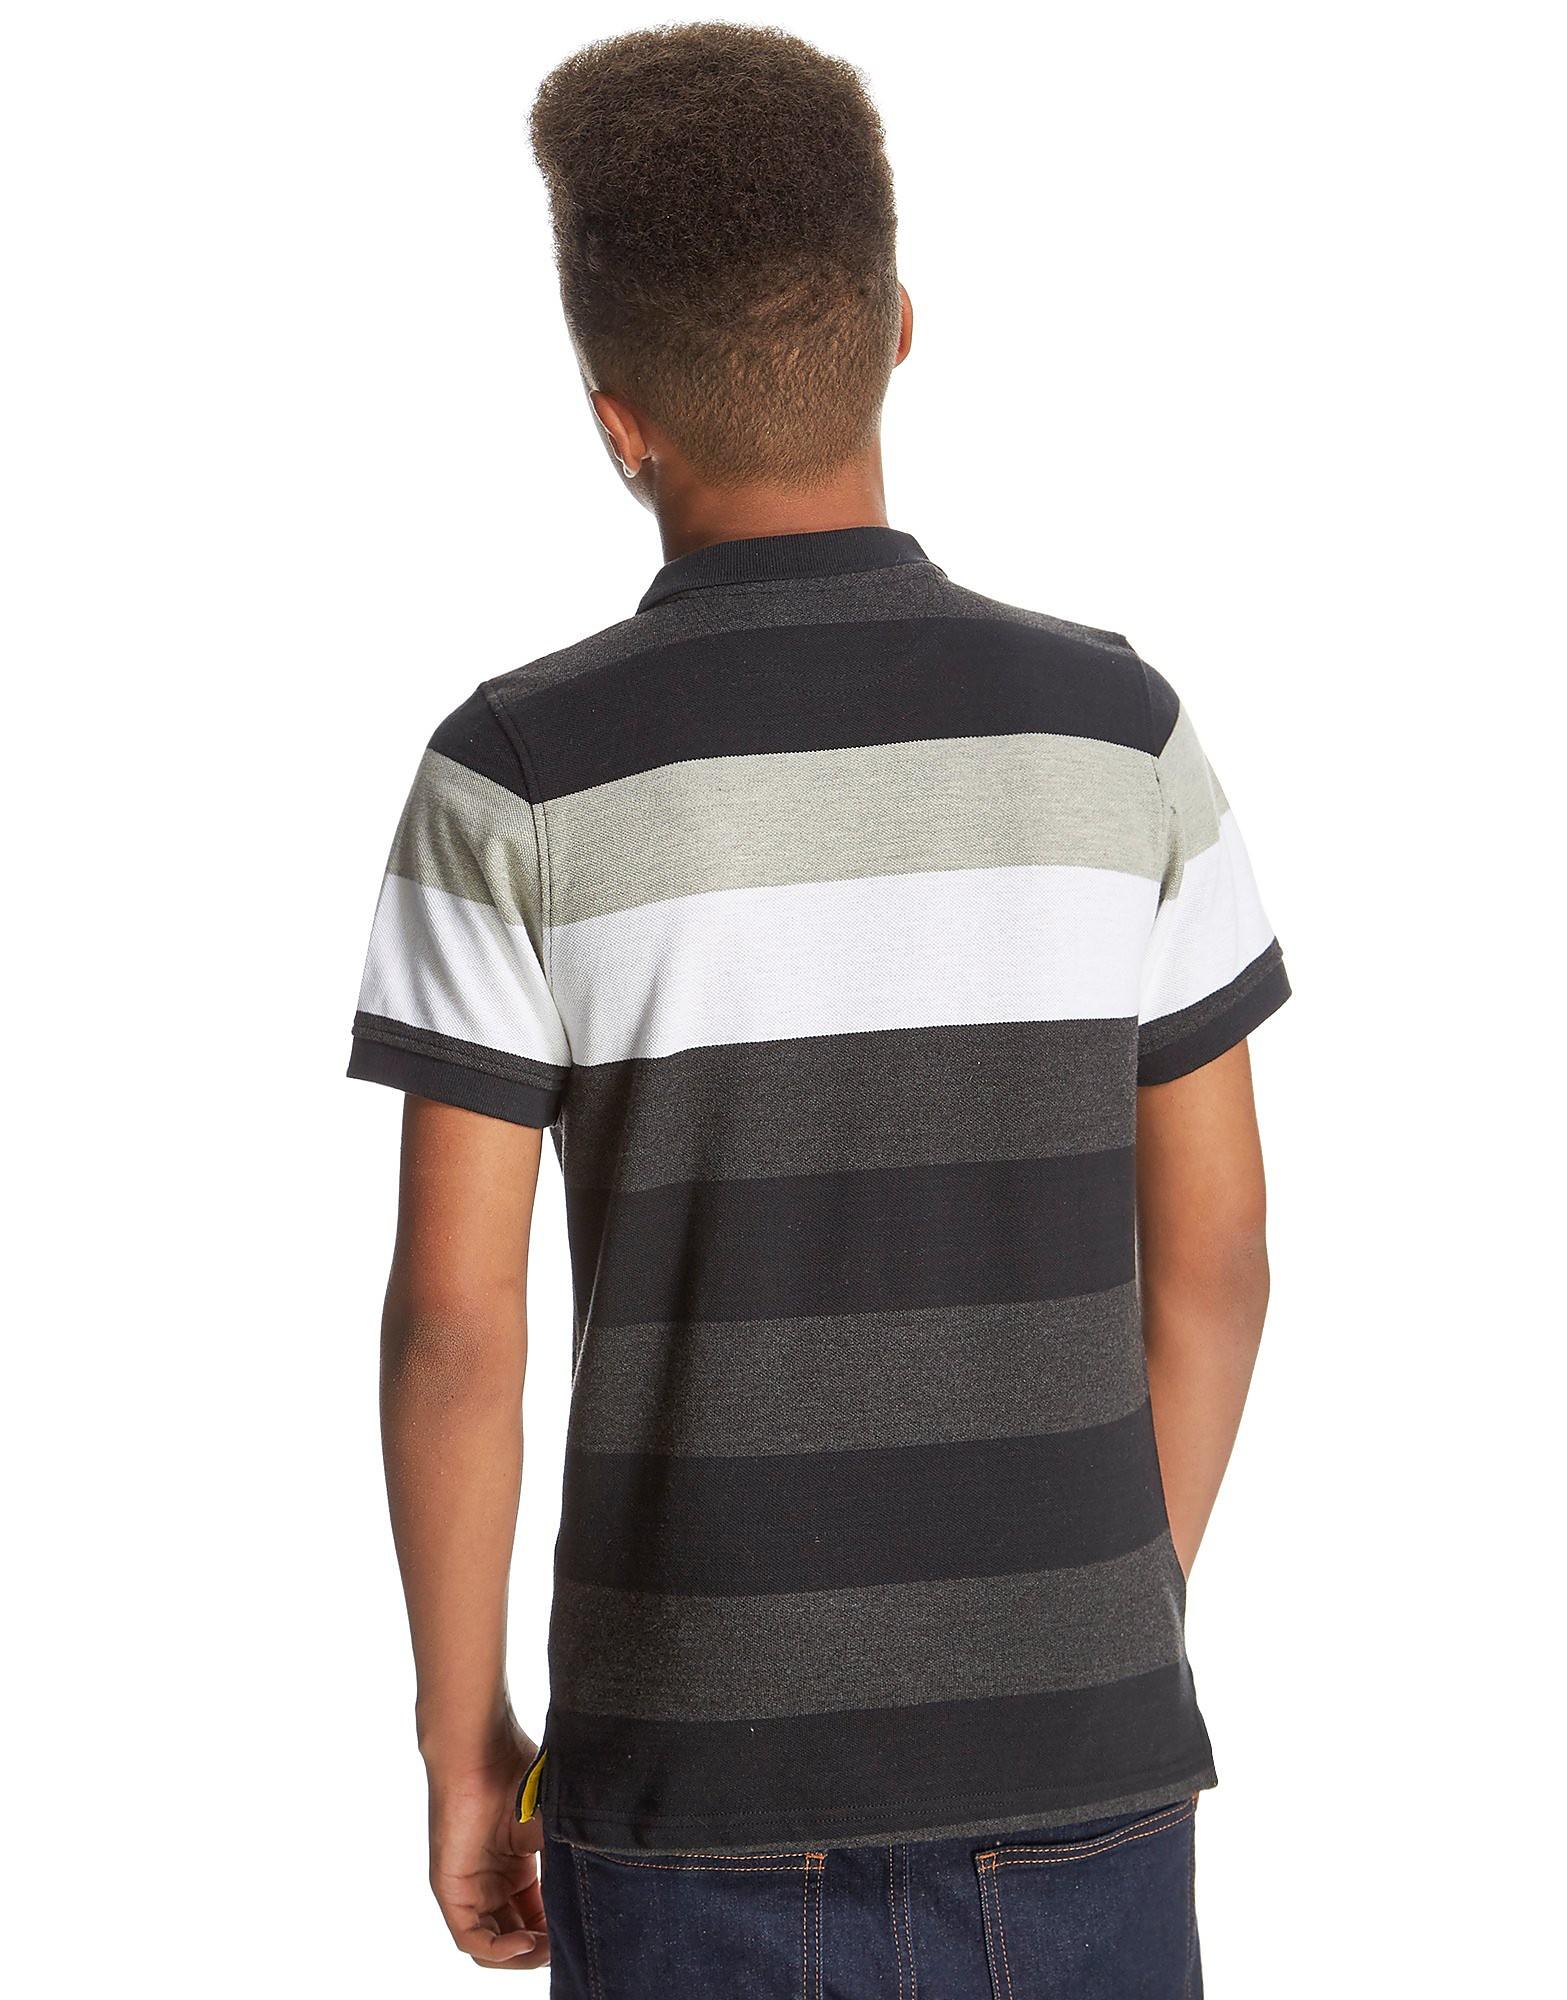 McKenzie Harwood Polo Shirt Junior